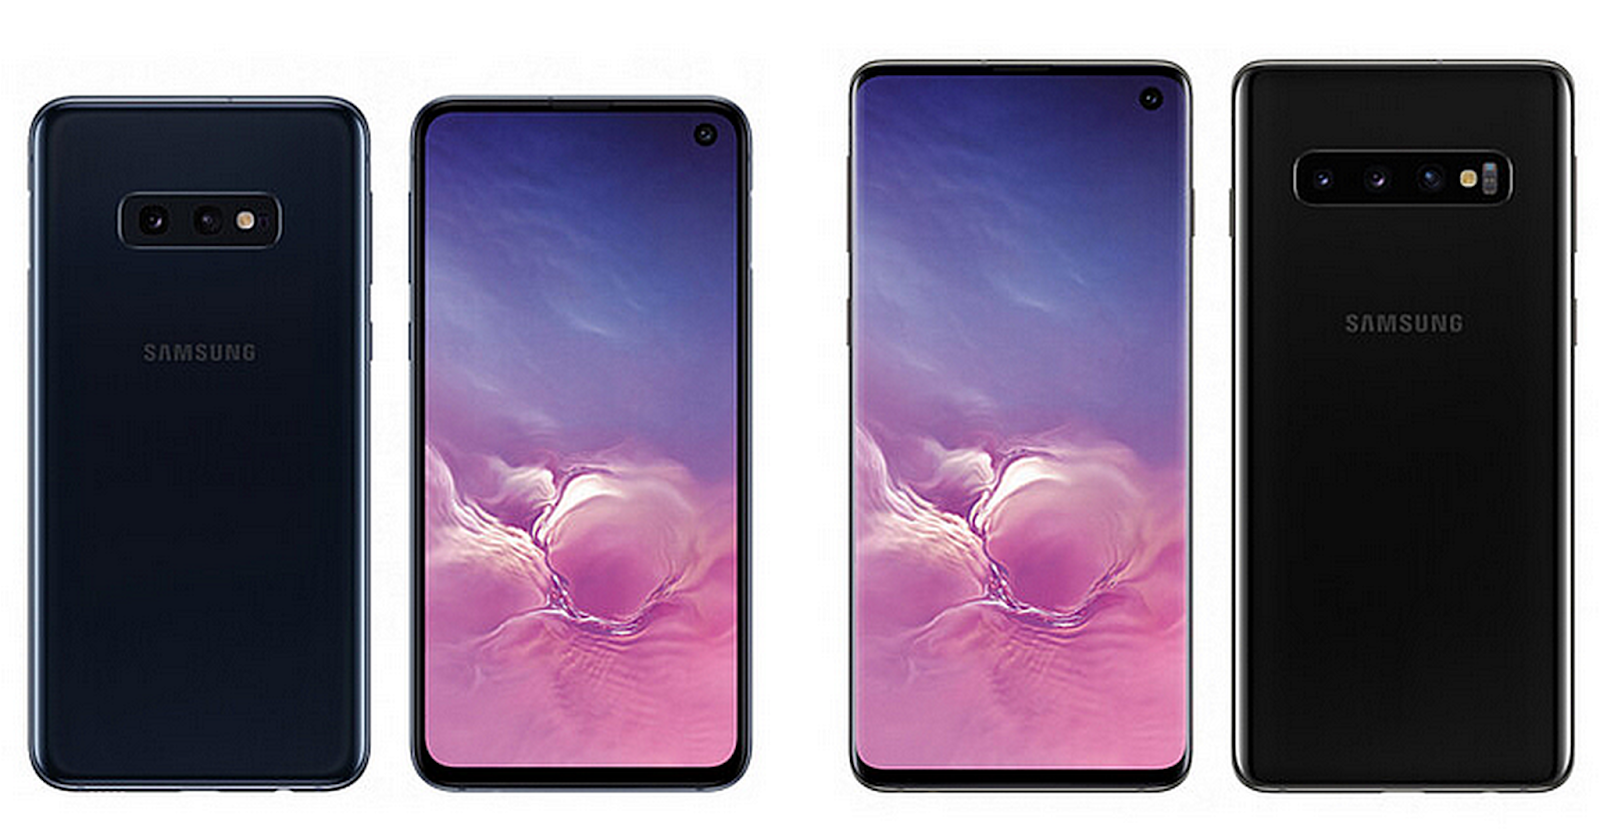 Samsung Galaxy S10 Wallpaper Hd Download Live 4k Cellular Futures